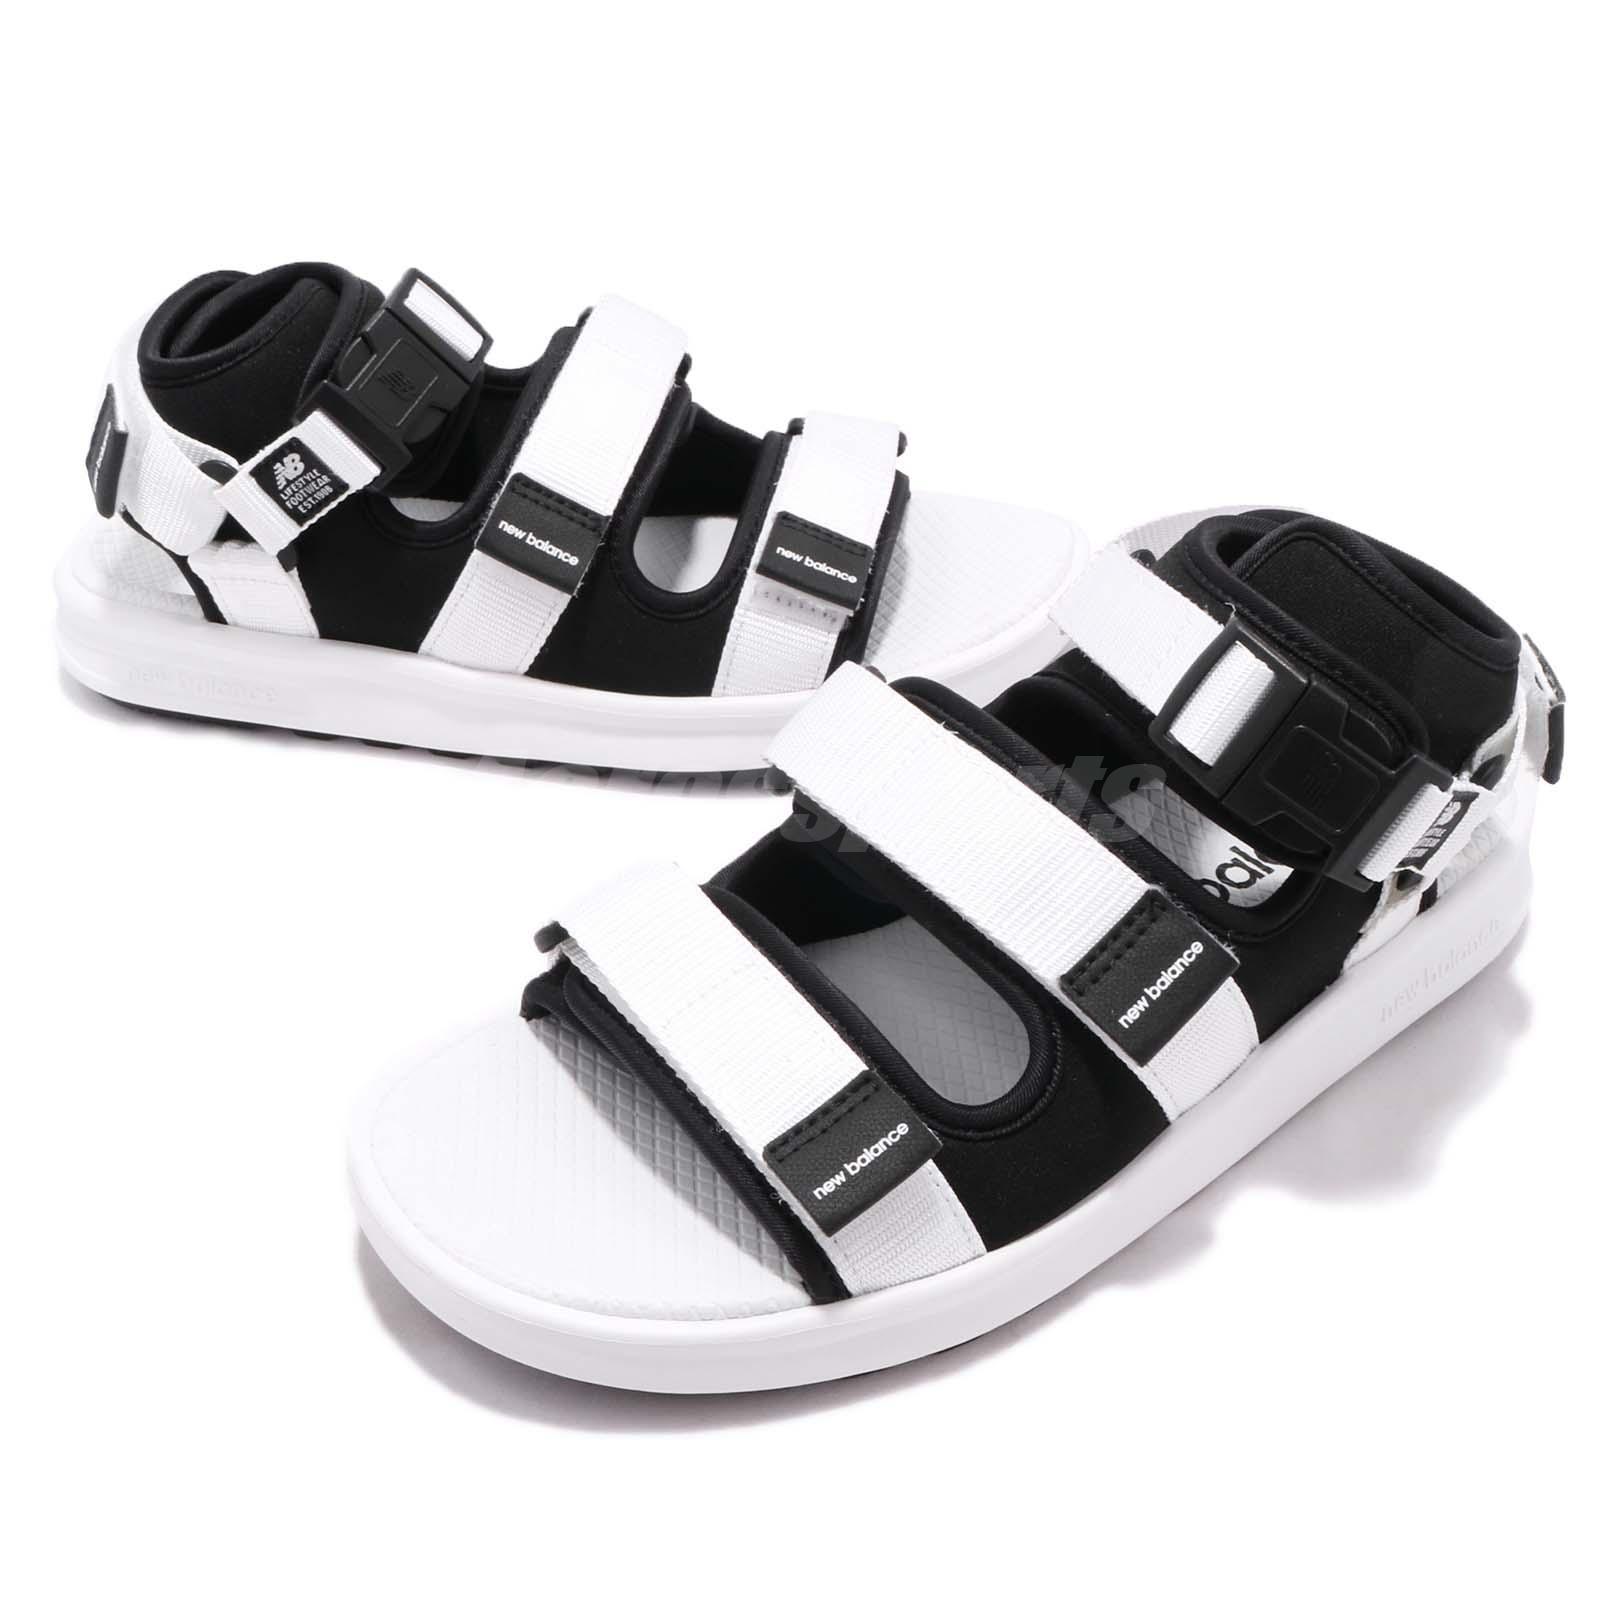 c4c719026c55af New Balance SD750BW D White Black One Click Men Women Sandal Shoes ...